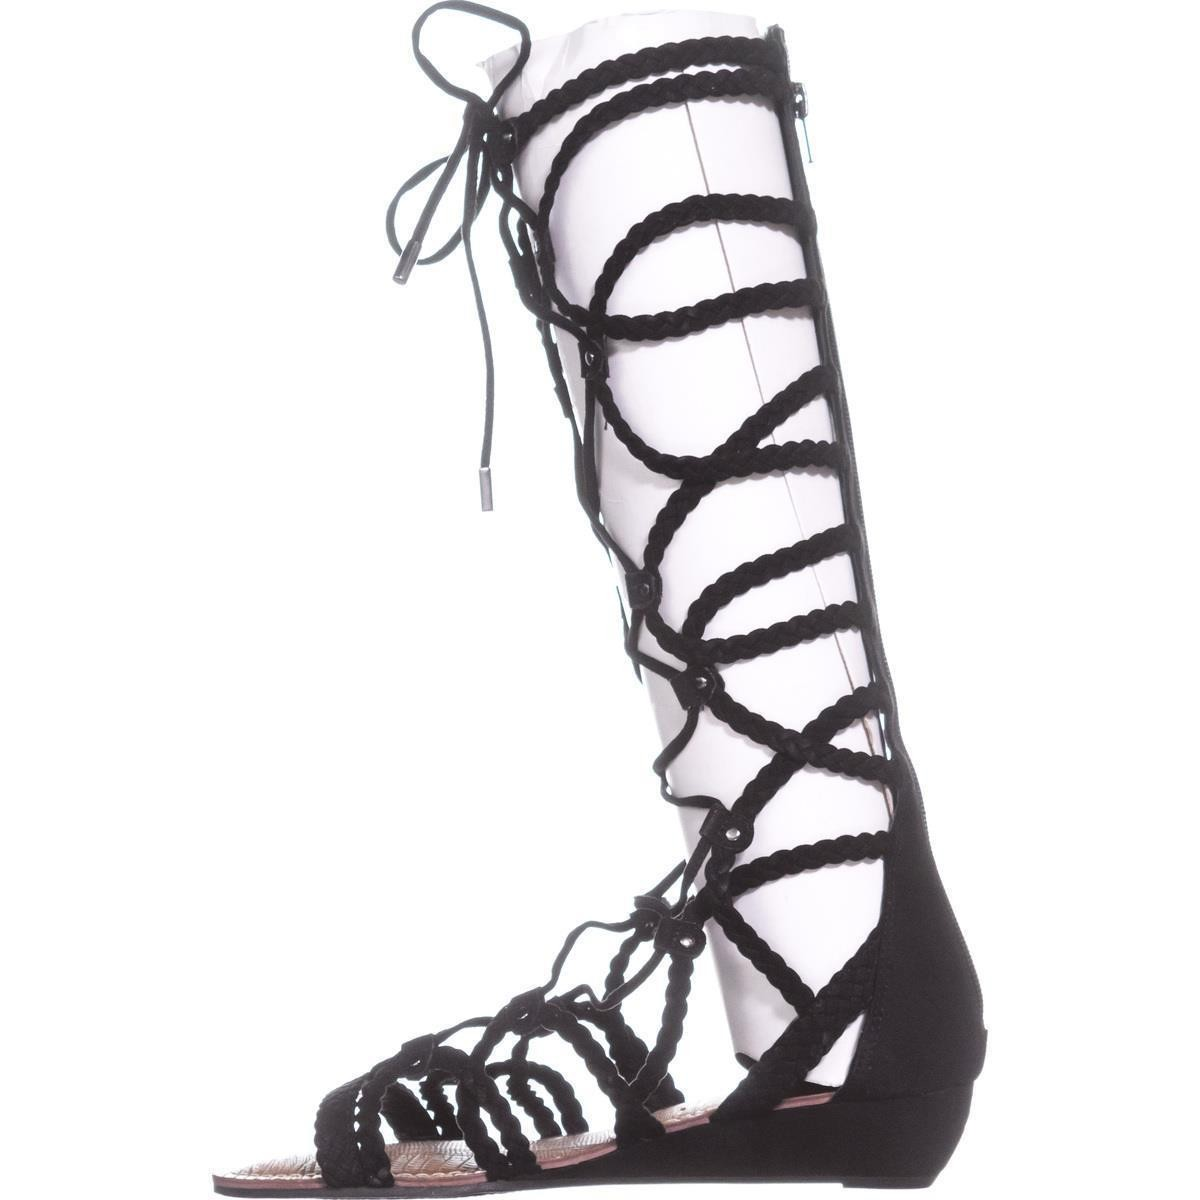 4629566969cf 1200x1200 Carlos By Carlos Santana Kalee Knee High Braided Gladiator Sandals